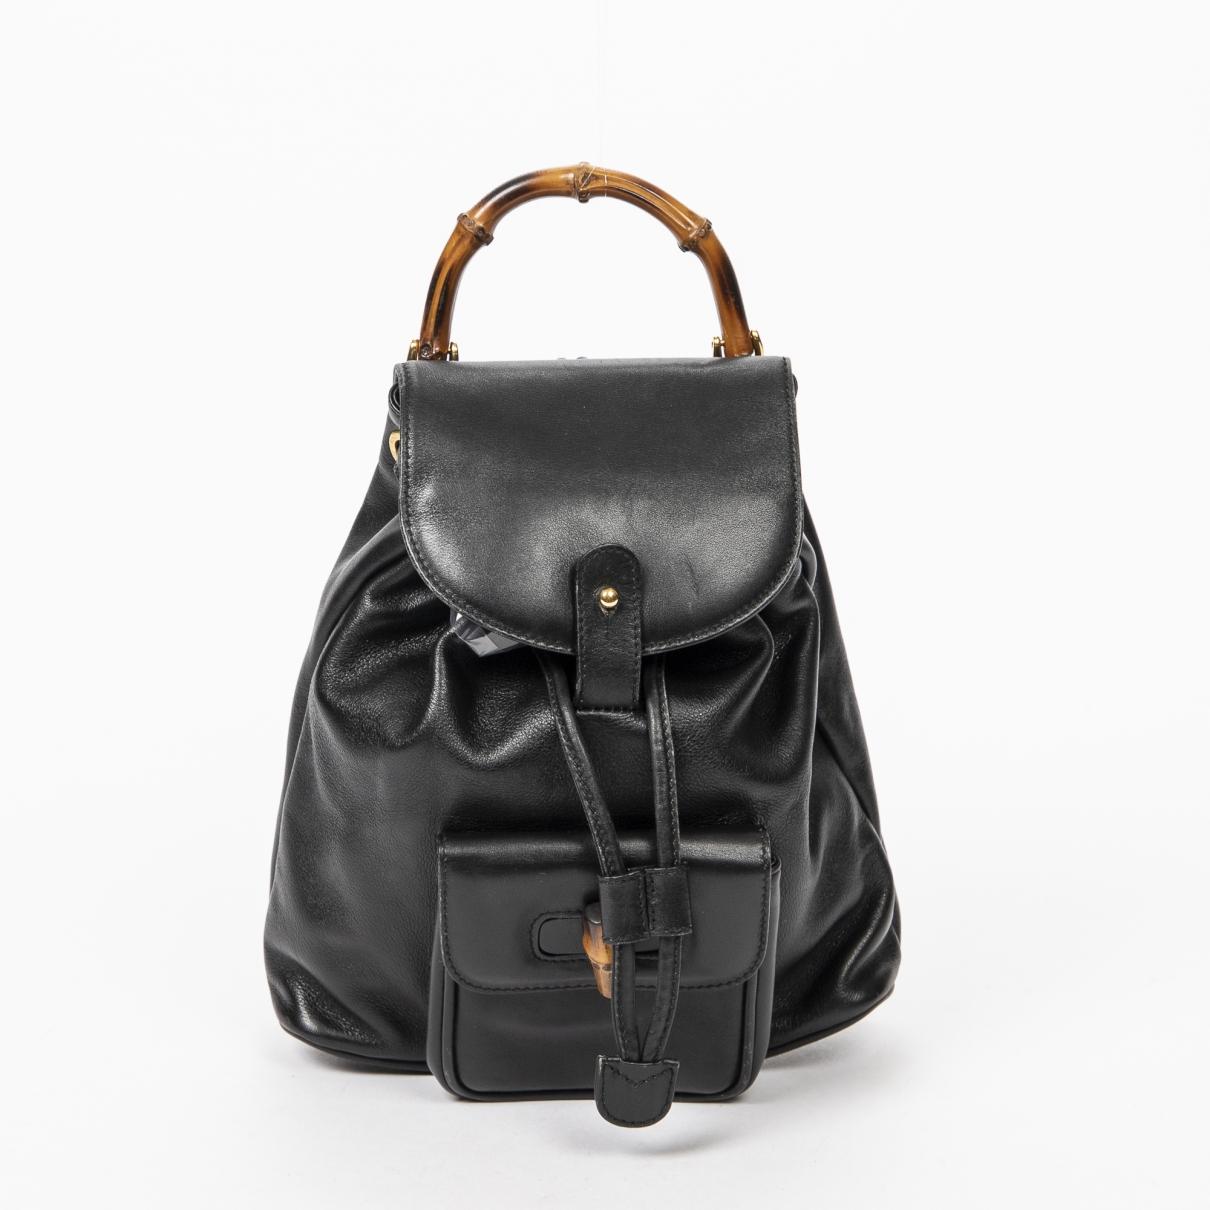 Gucci - Sac a dos Bamboo pour femme en cuir - noir